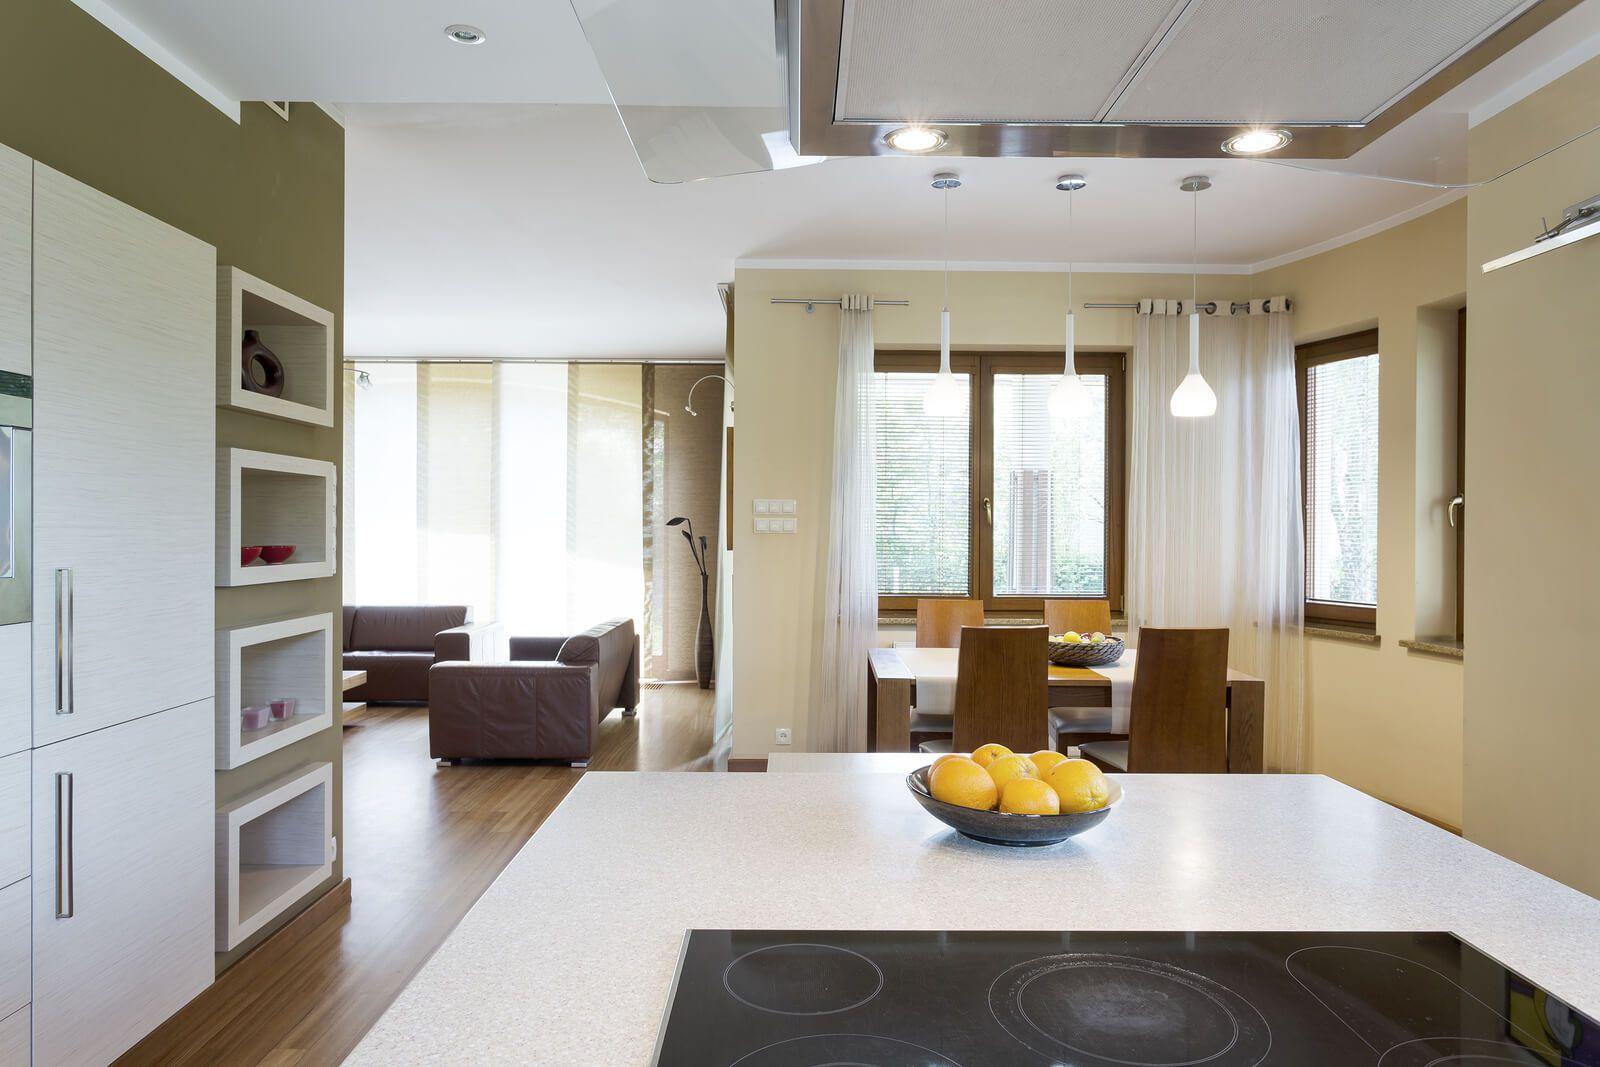 home interior design spacious kitchen